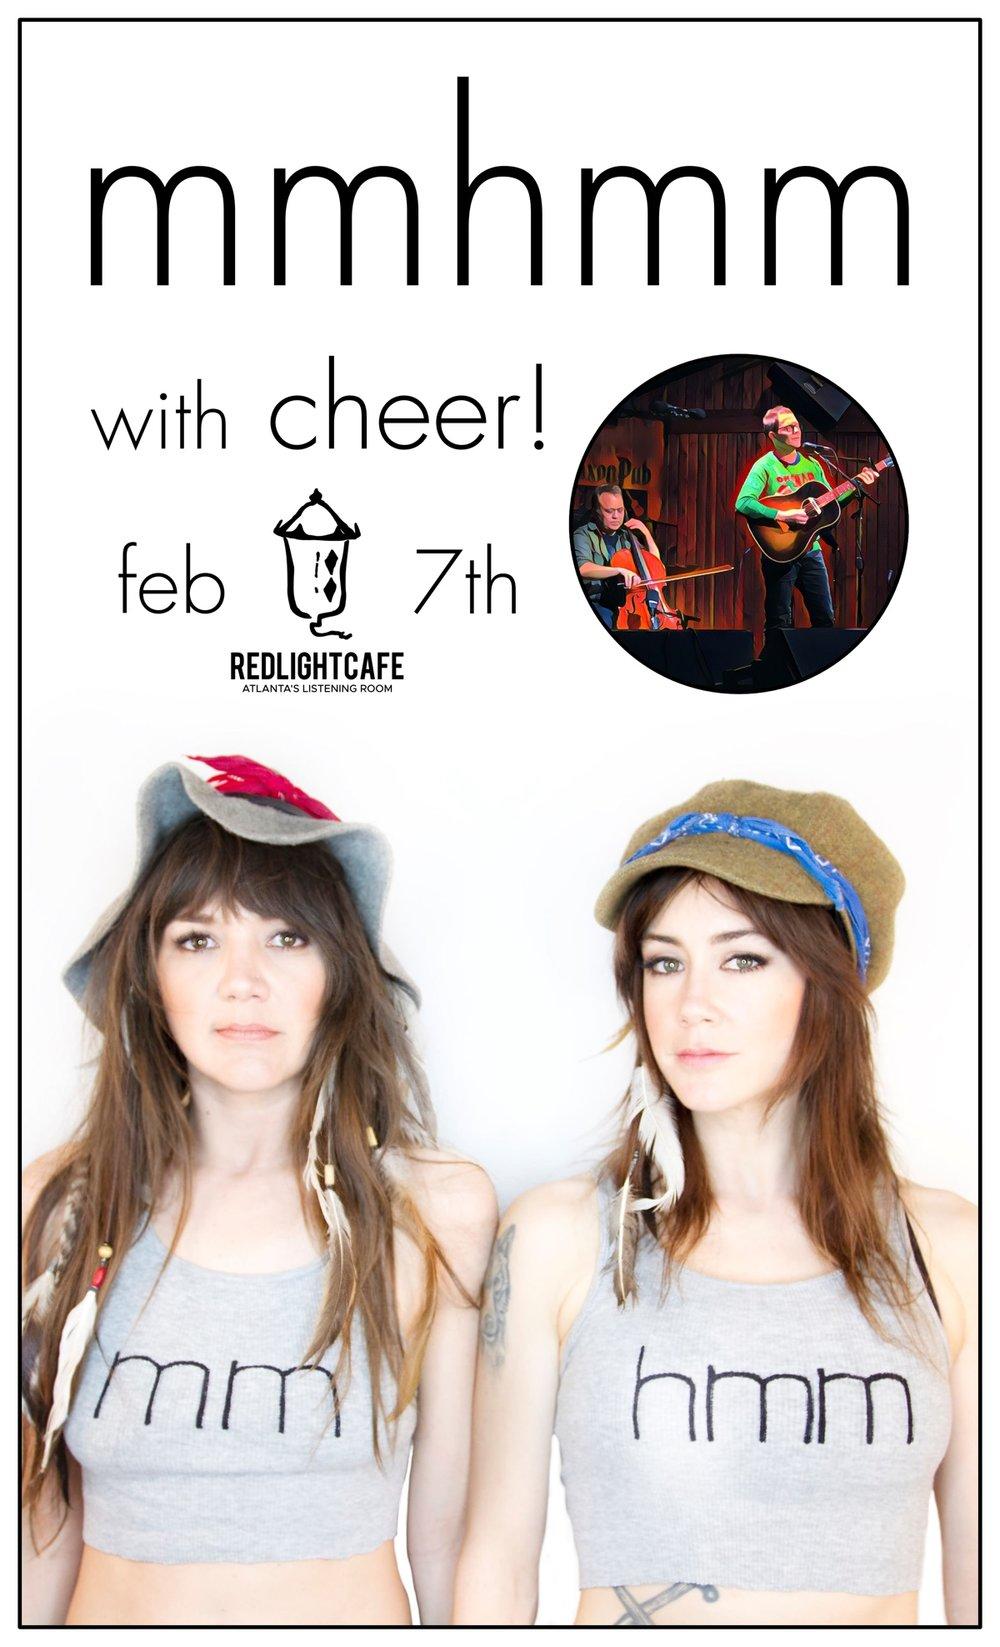 mmhmm w/ cheer! — February 7, 2019 — Red Light Café, Atlanta, GA